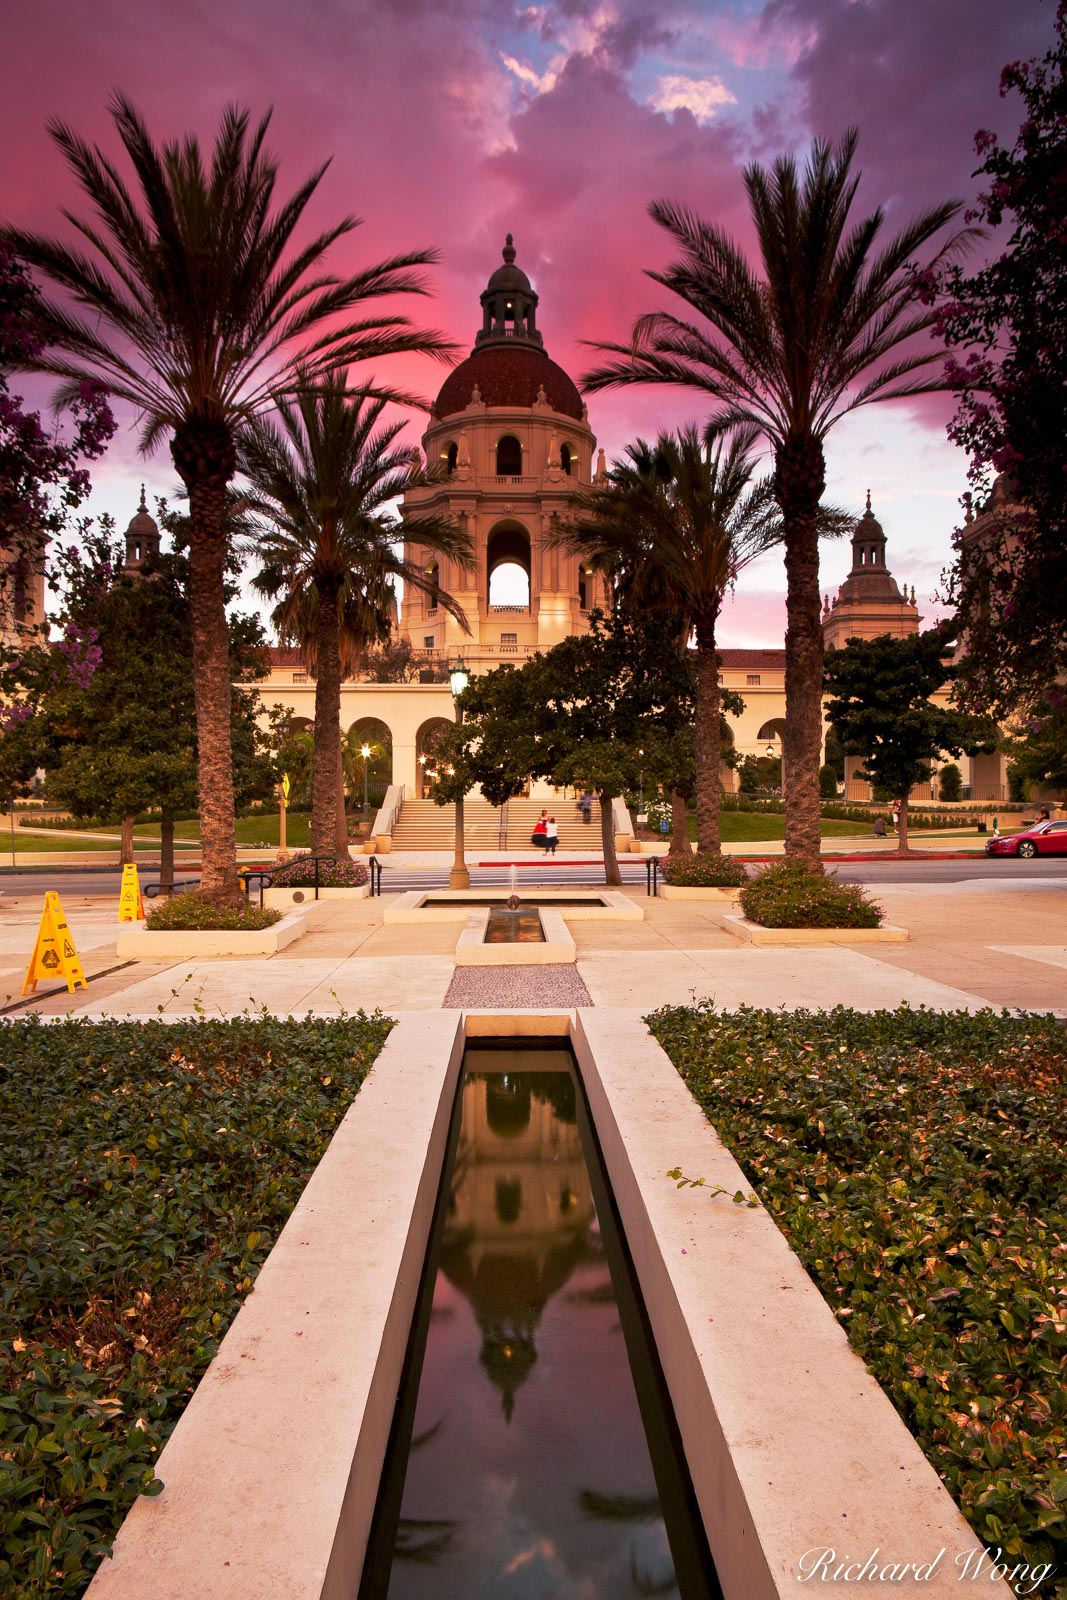 Pasadena City Hall Dome Reflection in Pond, Pasadena, California